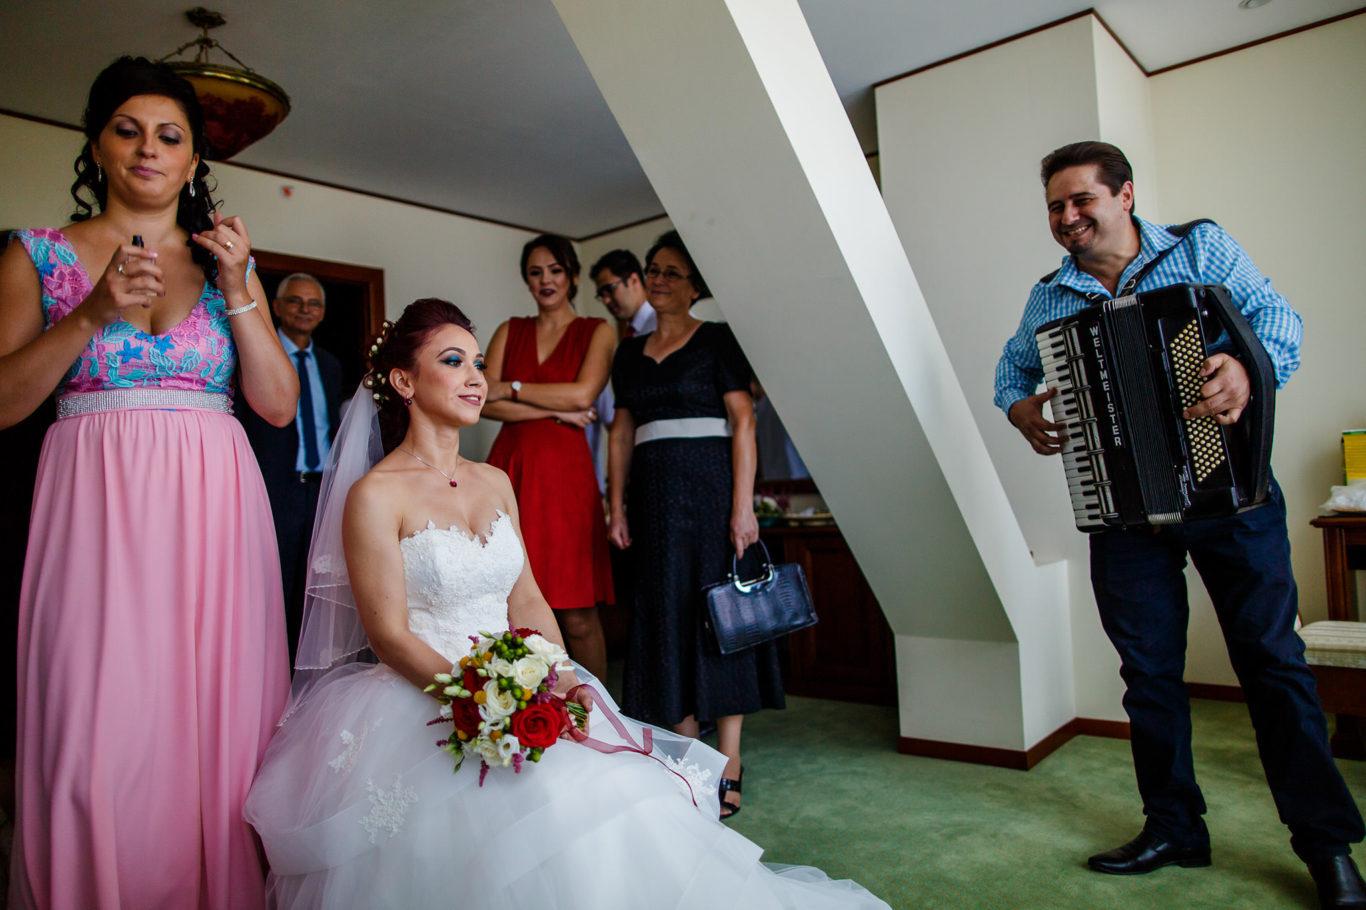 0111-fotografie-nunta-bucuresti-cristina-nicusor-fotograf-ciprian-dumitrescu-dc1_9970